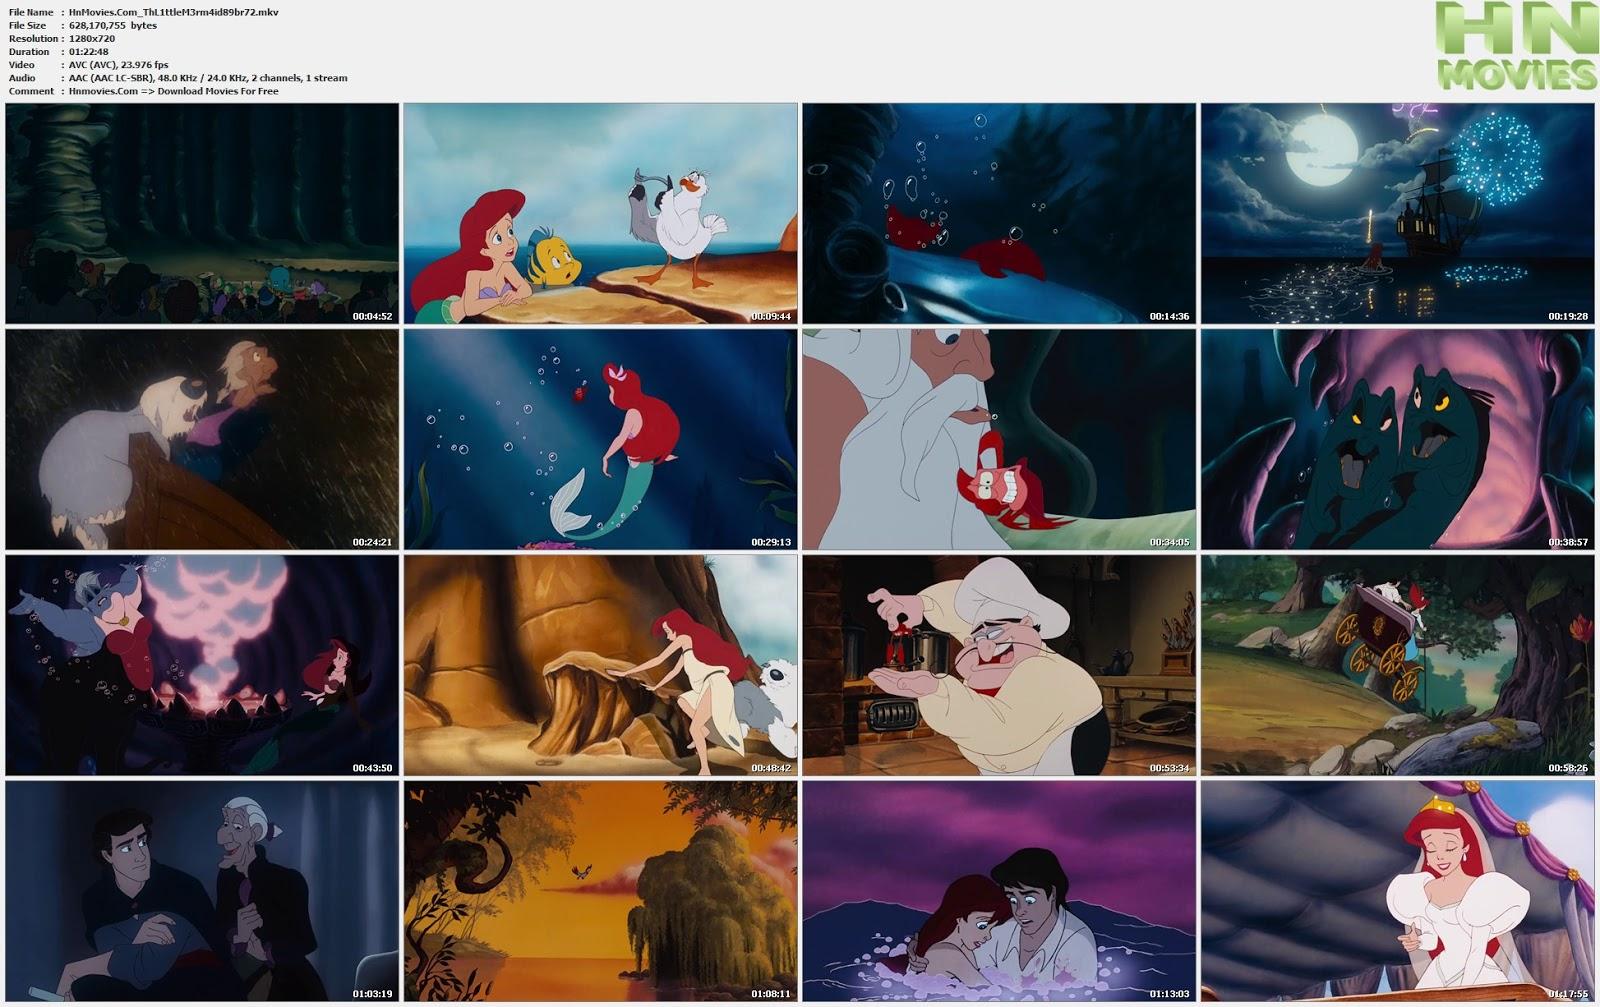 movie screenshot of The Little Mermaid fdmovie.com